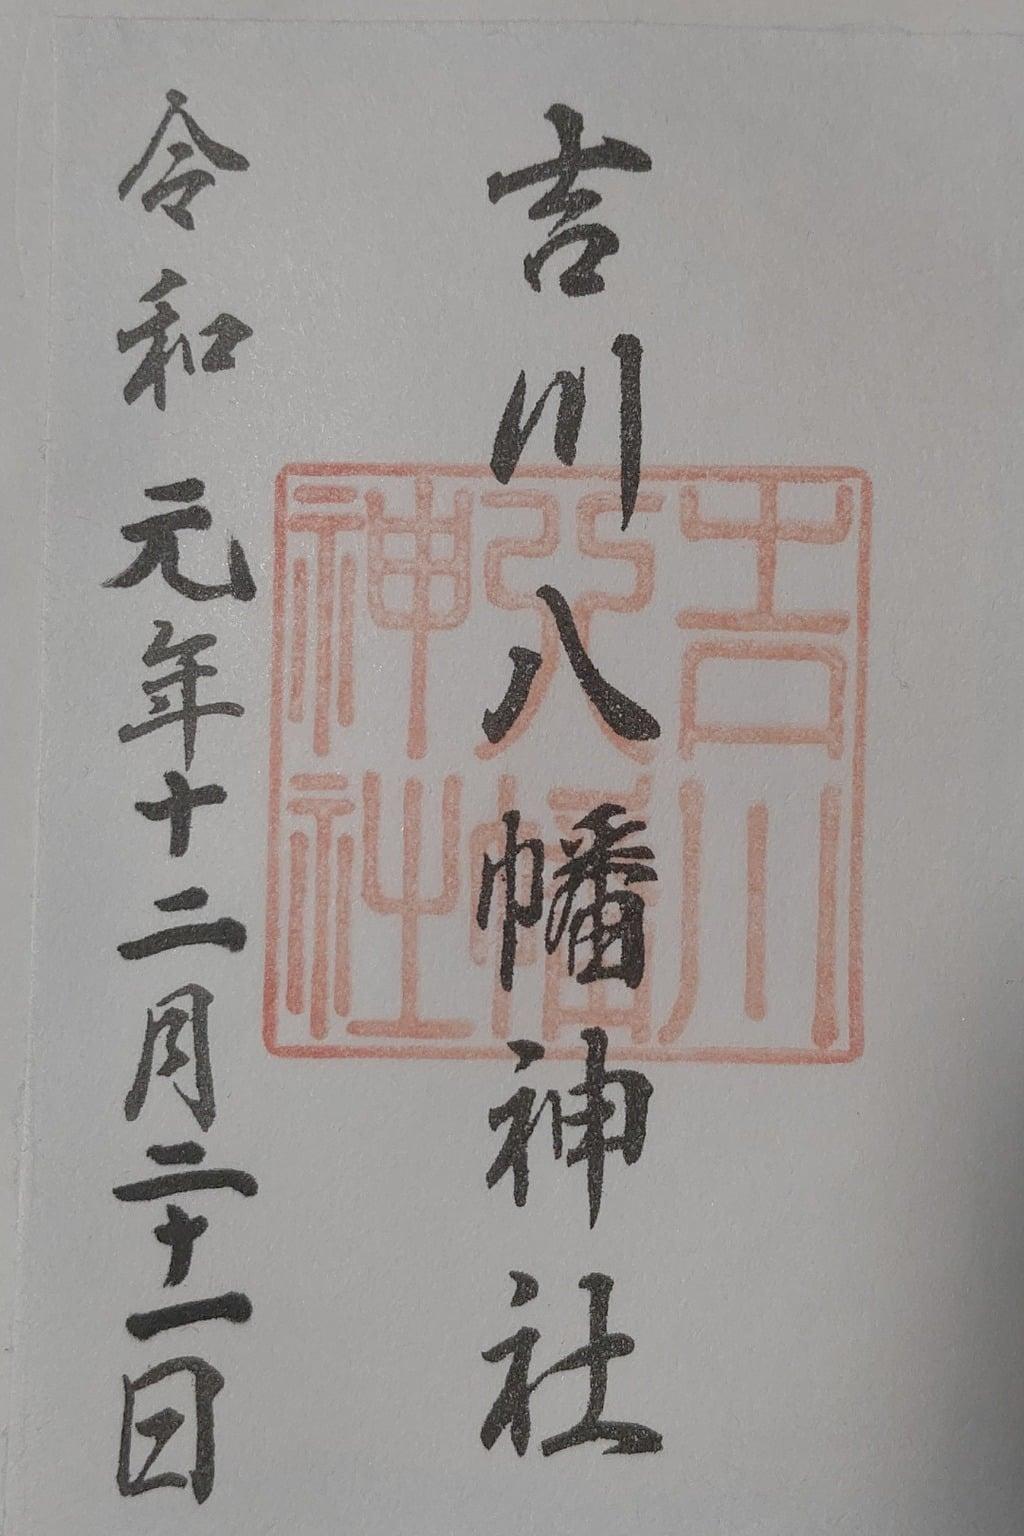 吉川八幡神社の御朱印